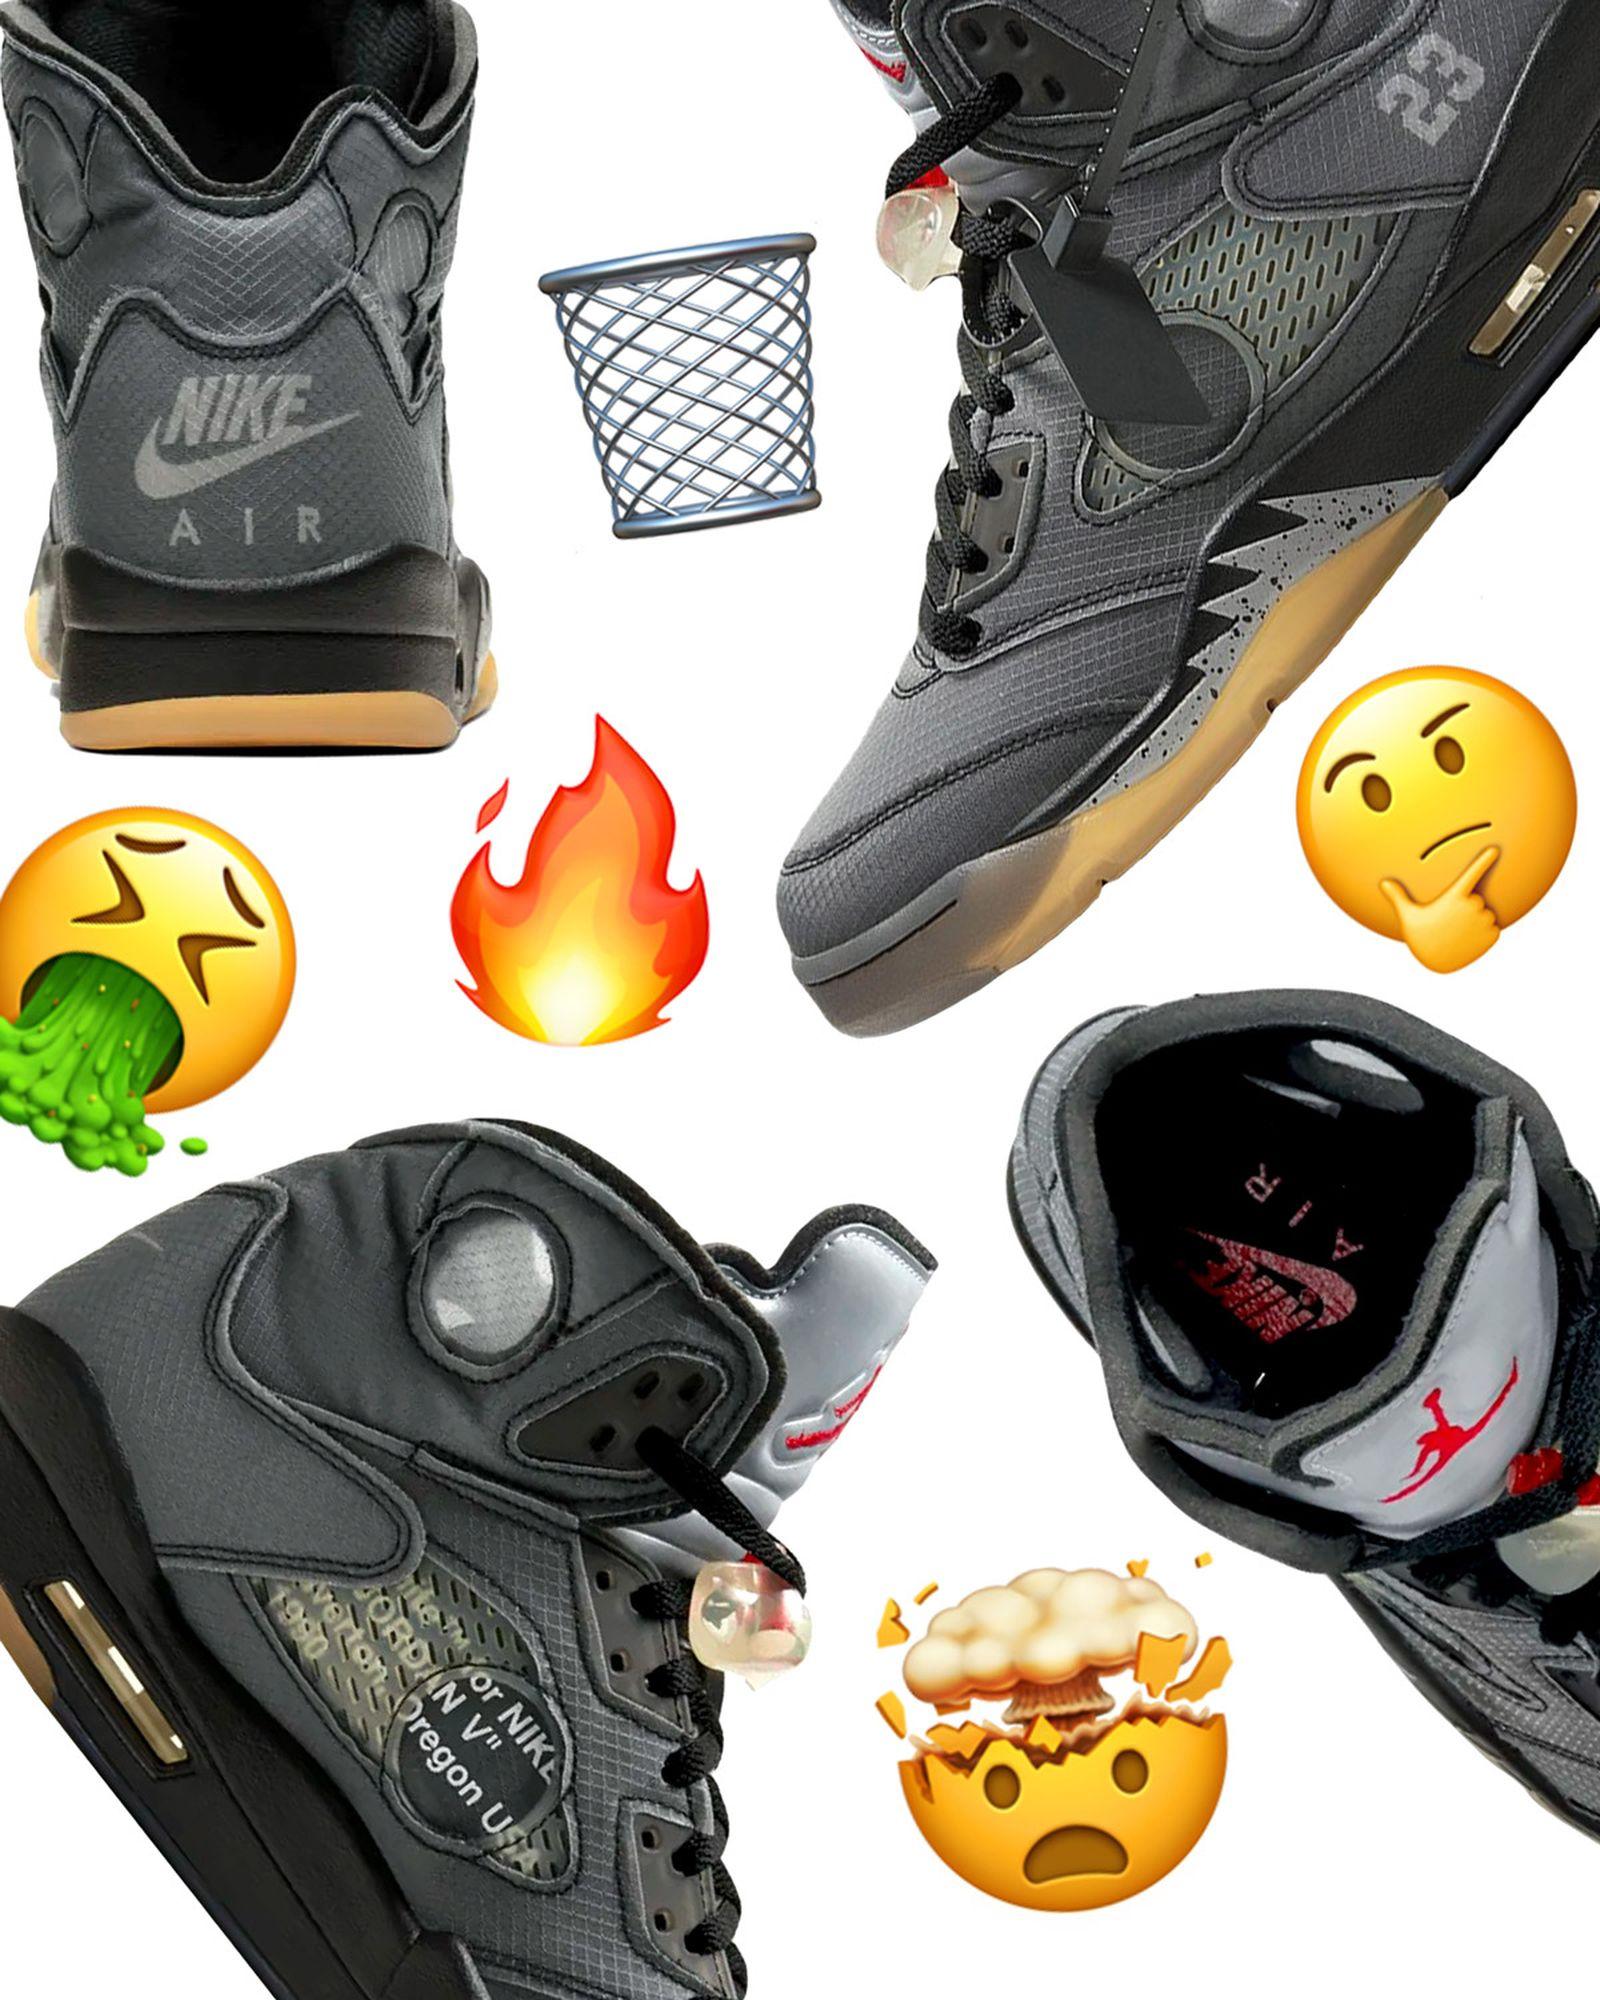 200214_ED_WEB_The_Sneaker_Jury_02